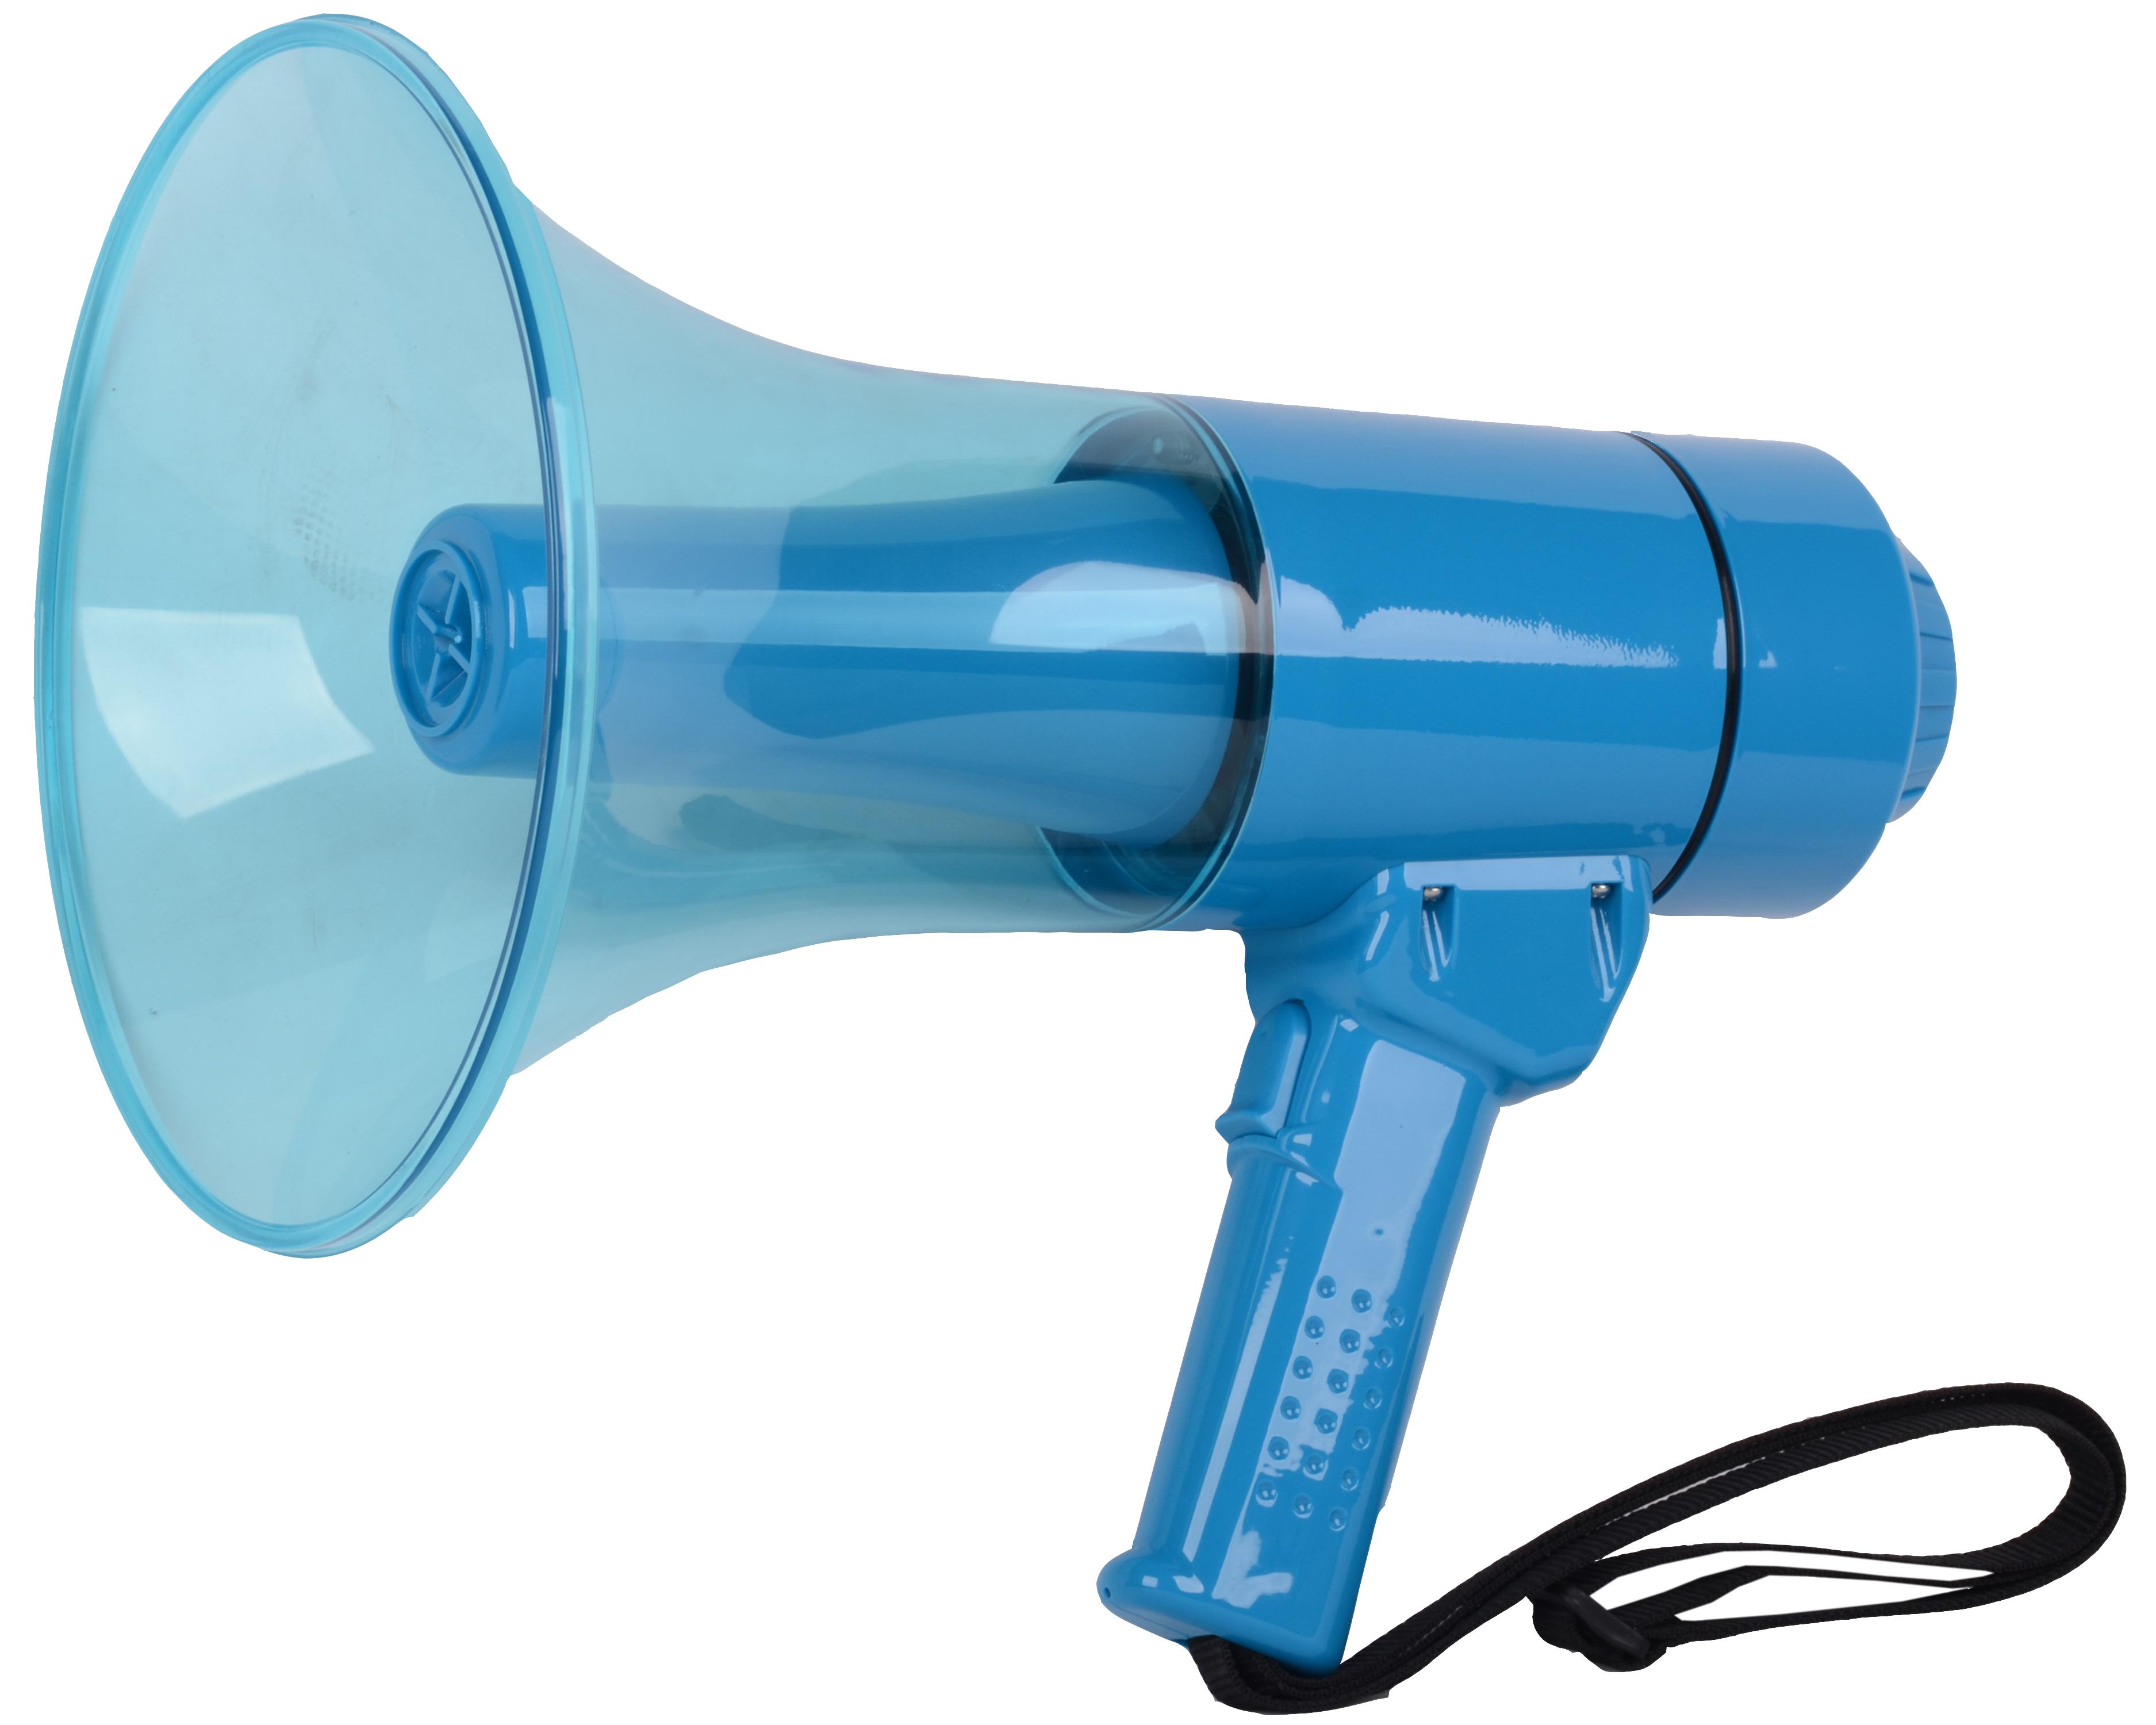 Handmegafon Megafon Spritzwasserschutz IP44